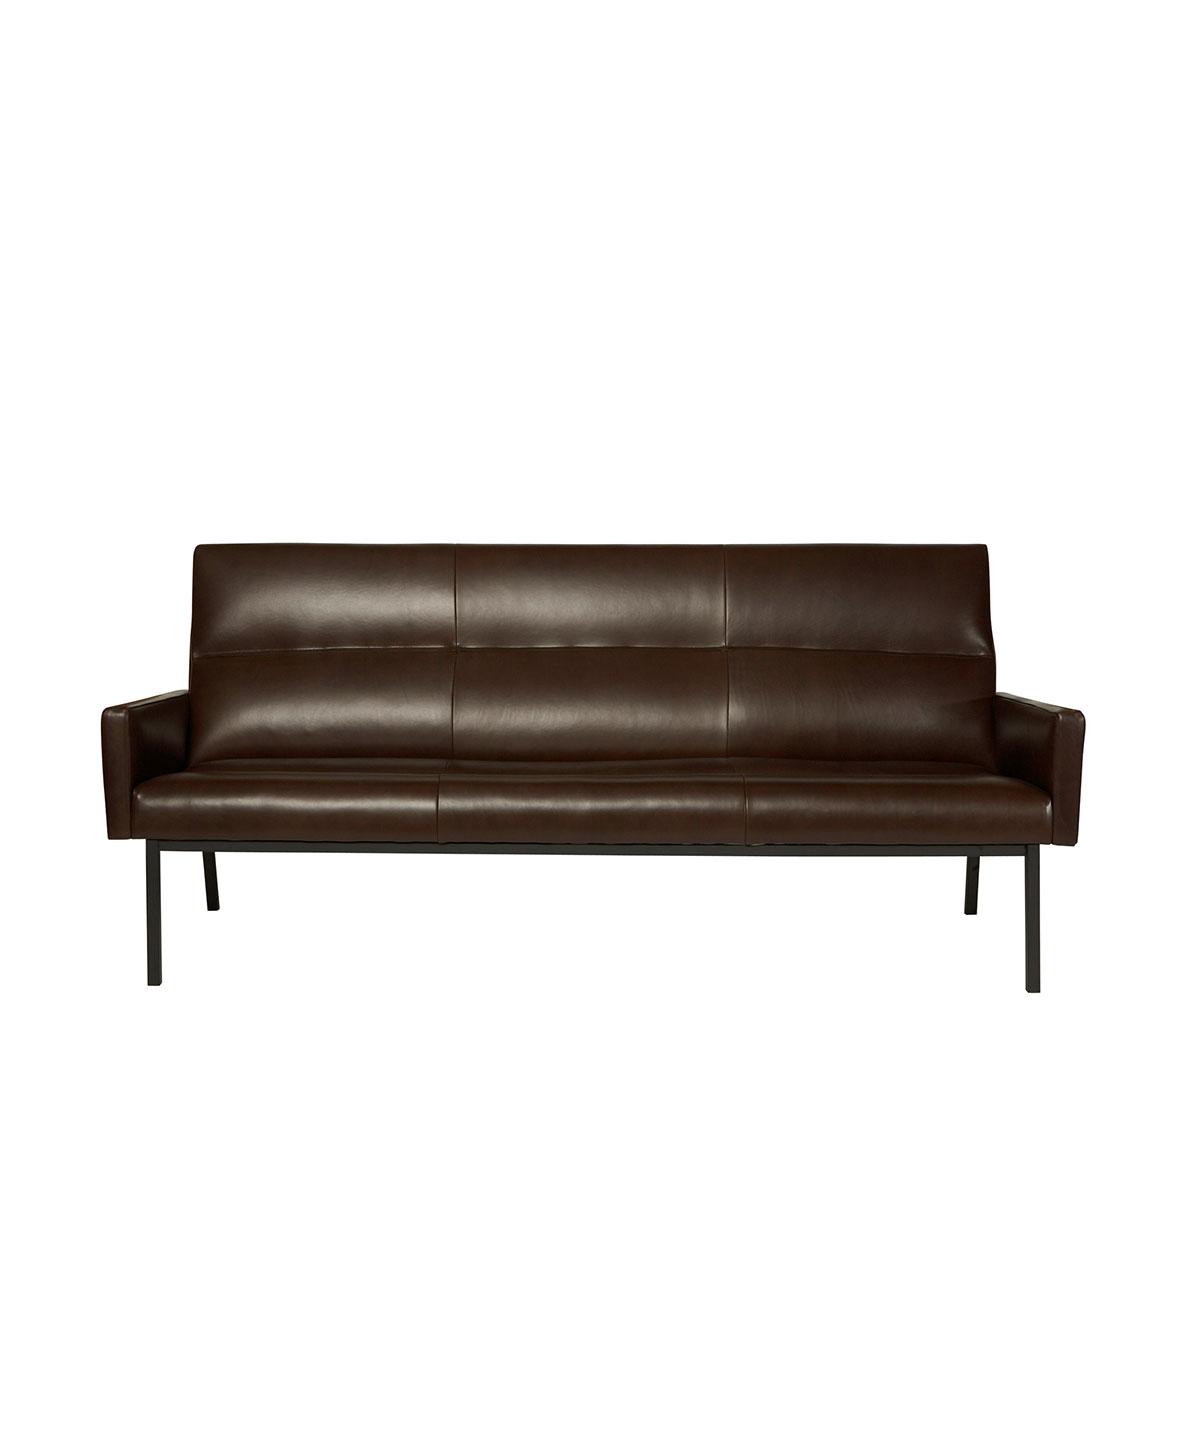 cisco brothers sofa reviews reclining sectional fabric artek leather kurtz collection